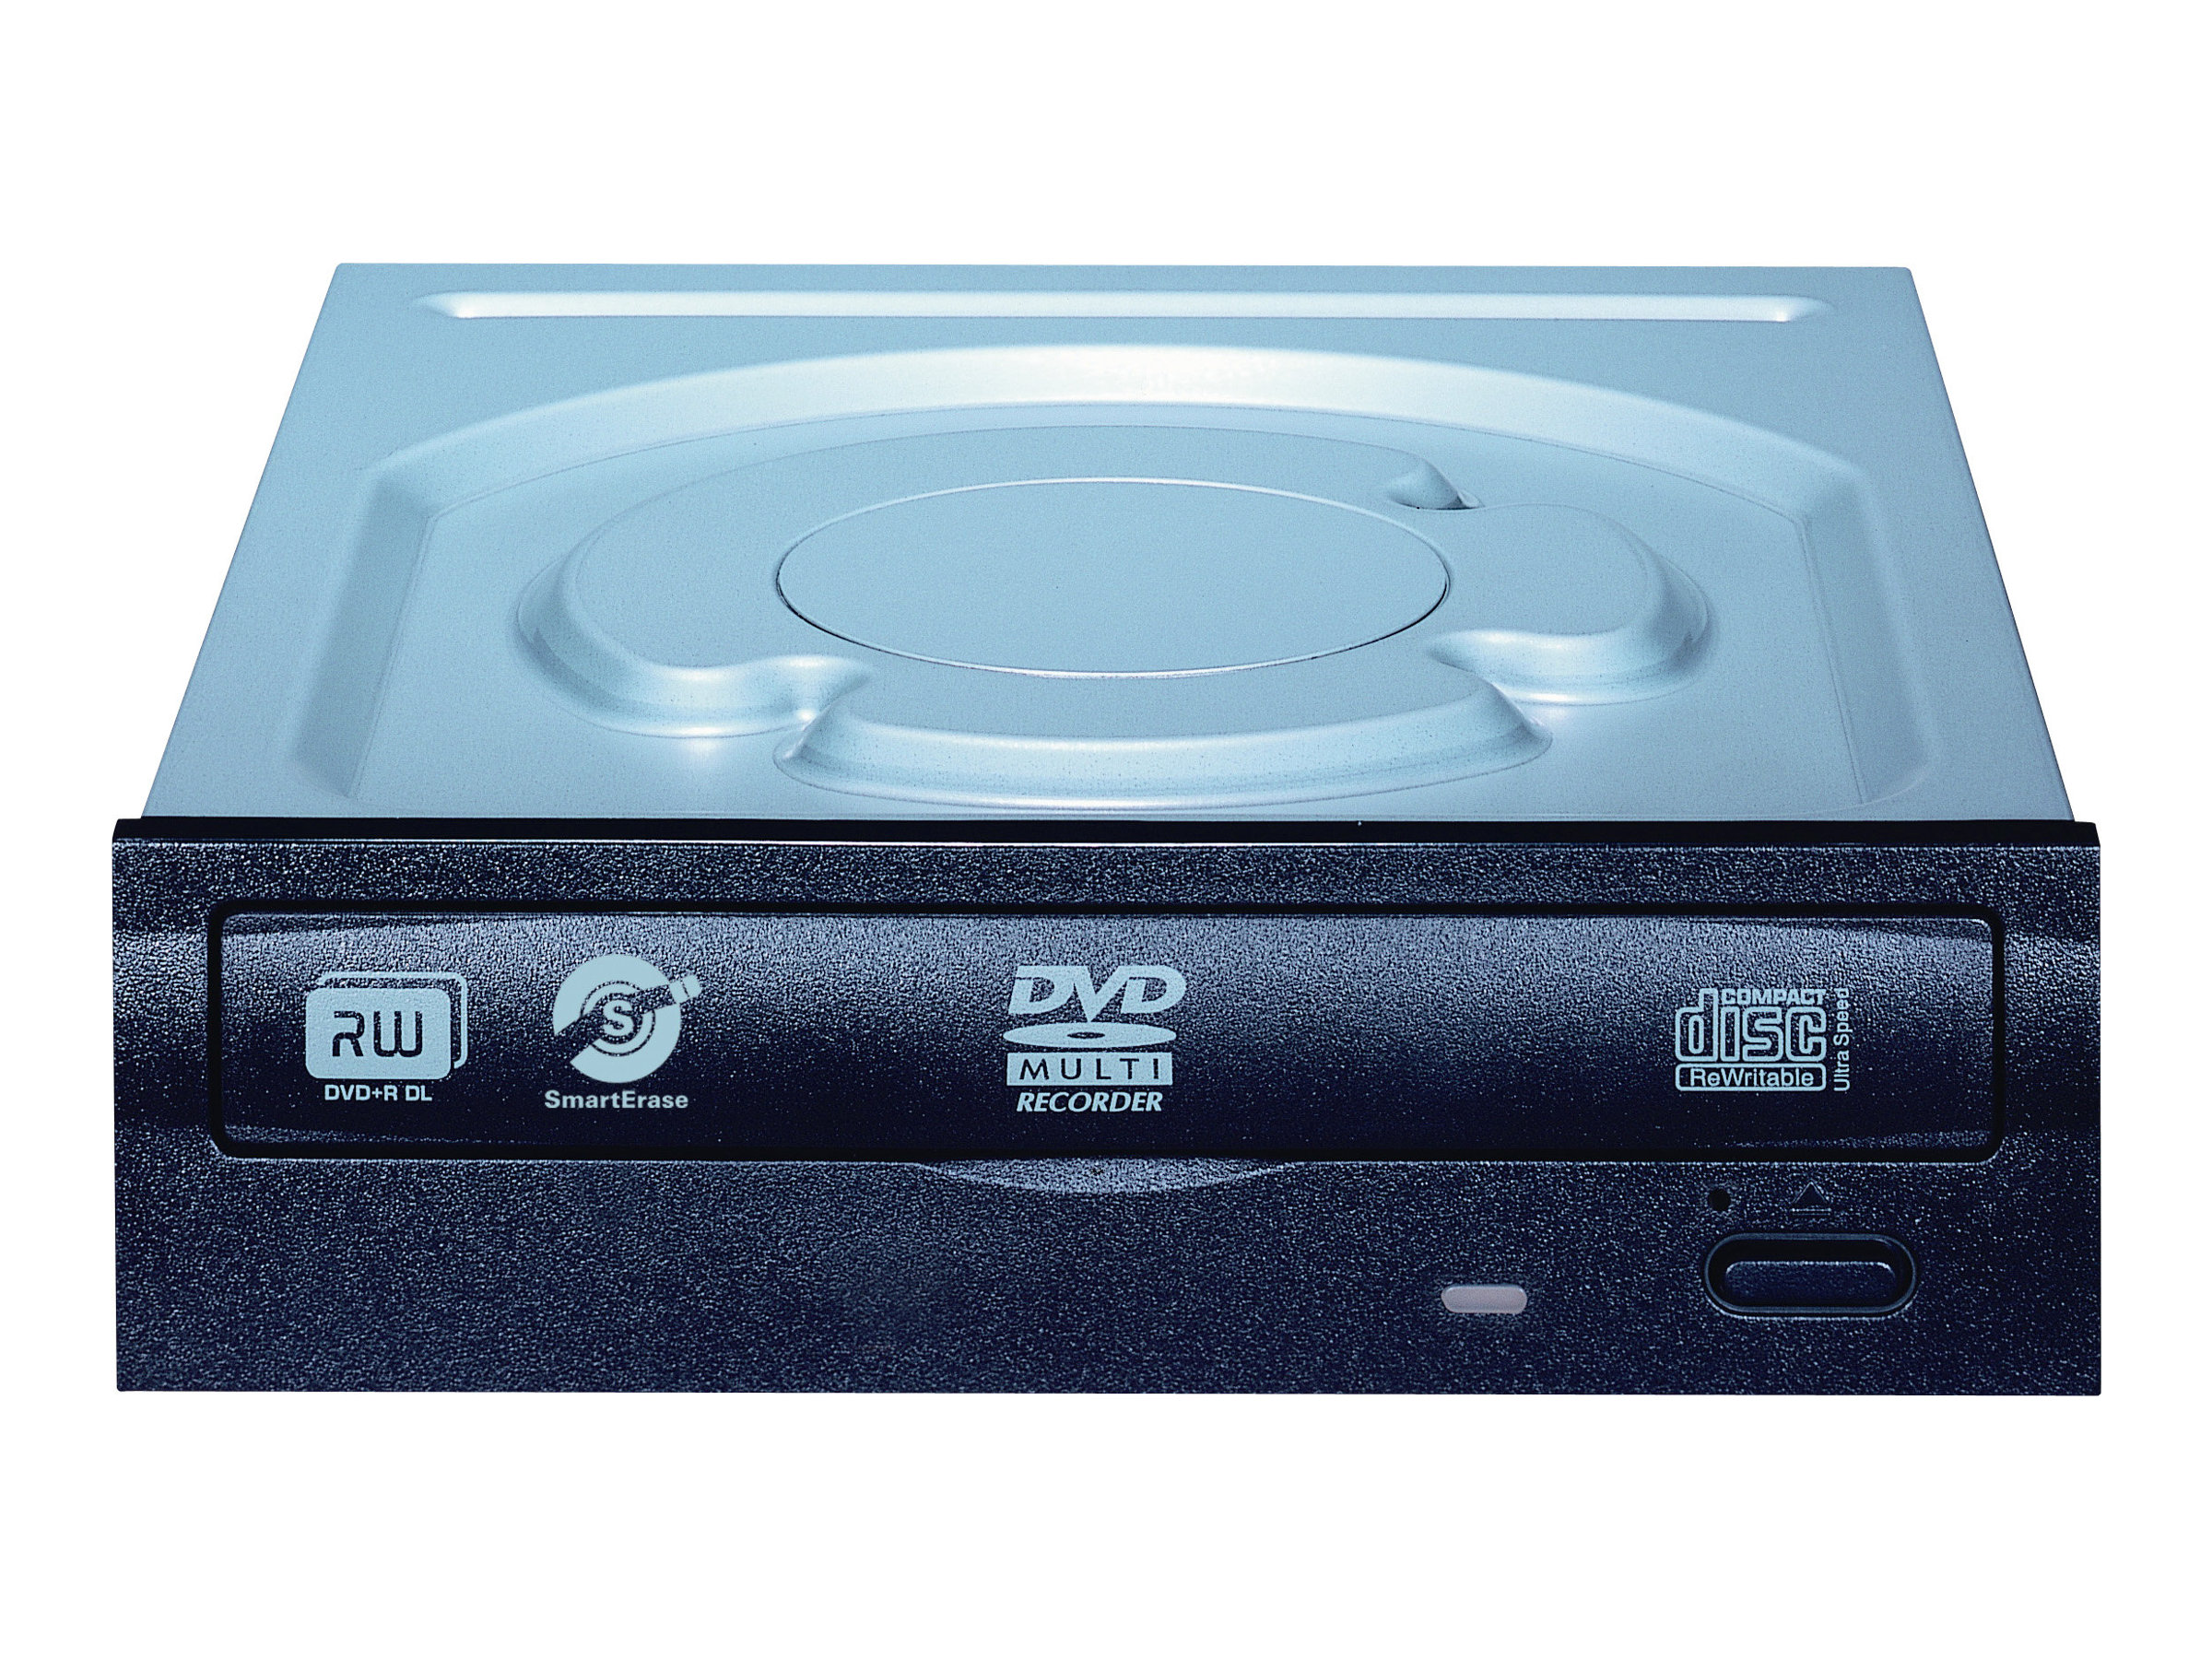 LiteOn iHAS124 - Laufwerk - DVD±RW (±R DL) / DVD-RAM - 24x/24x/12x - Serial ATA - intern